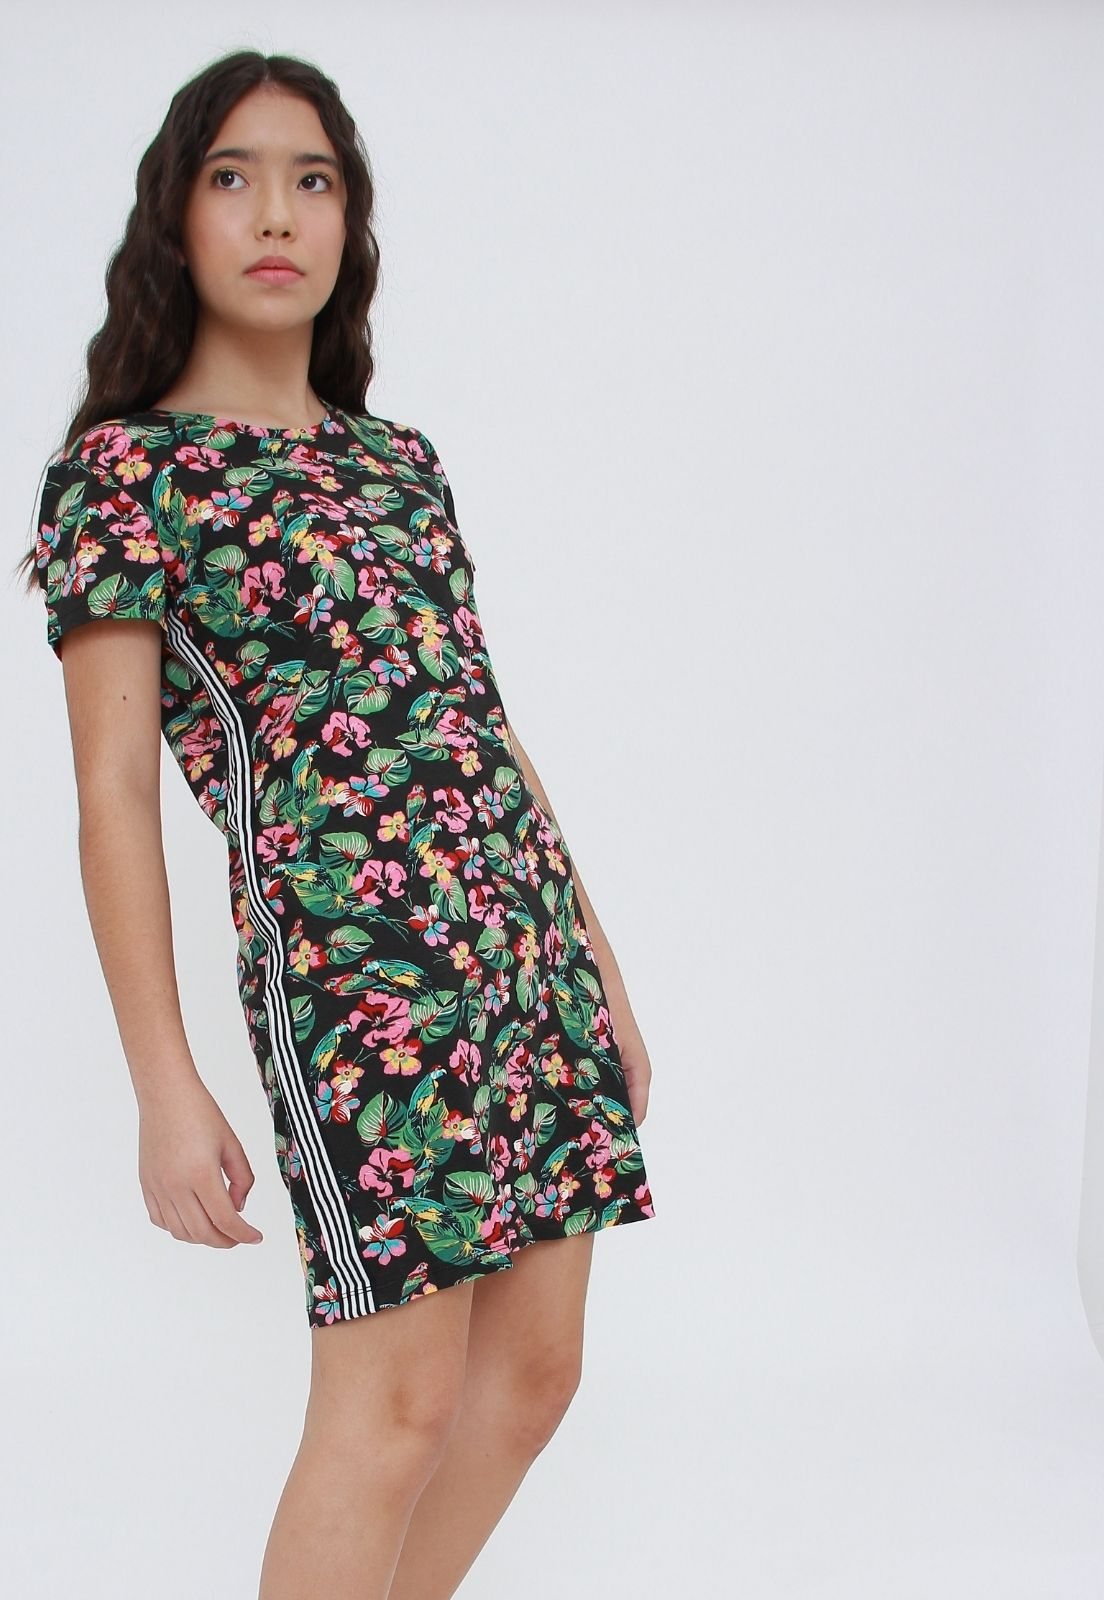 Vestido Tee Estampado Preto  - Metro & Co.